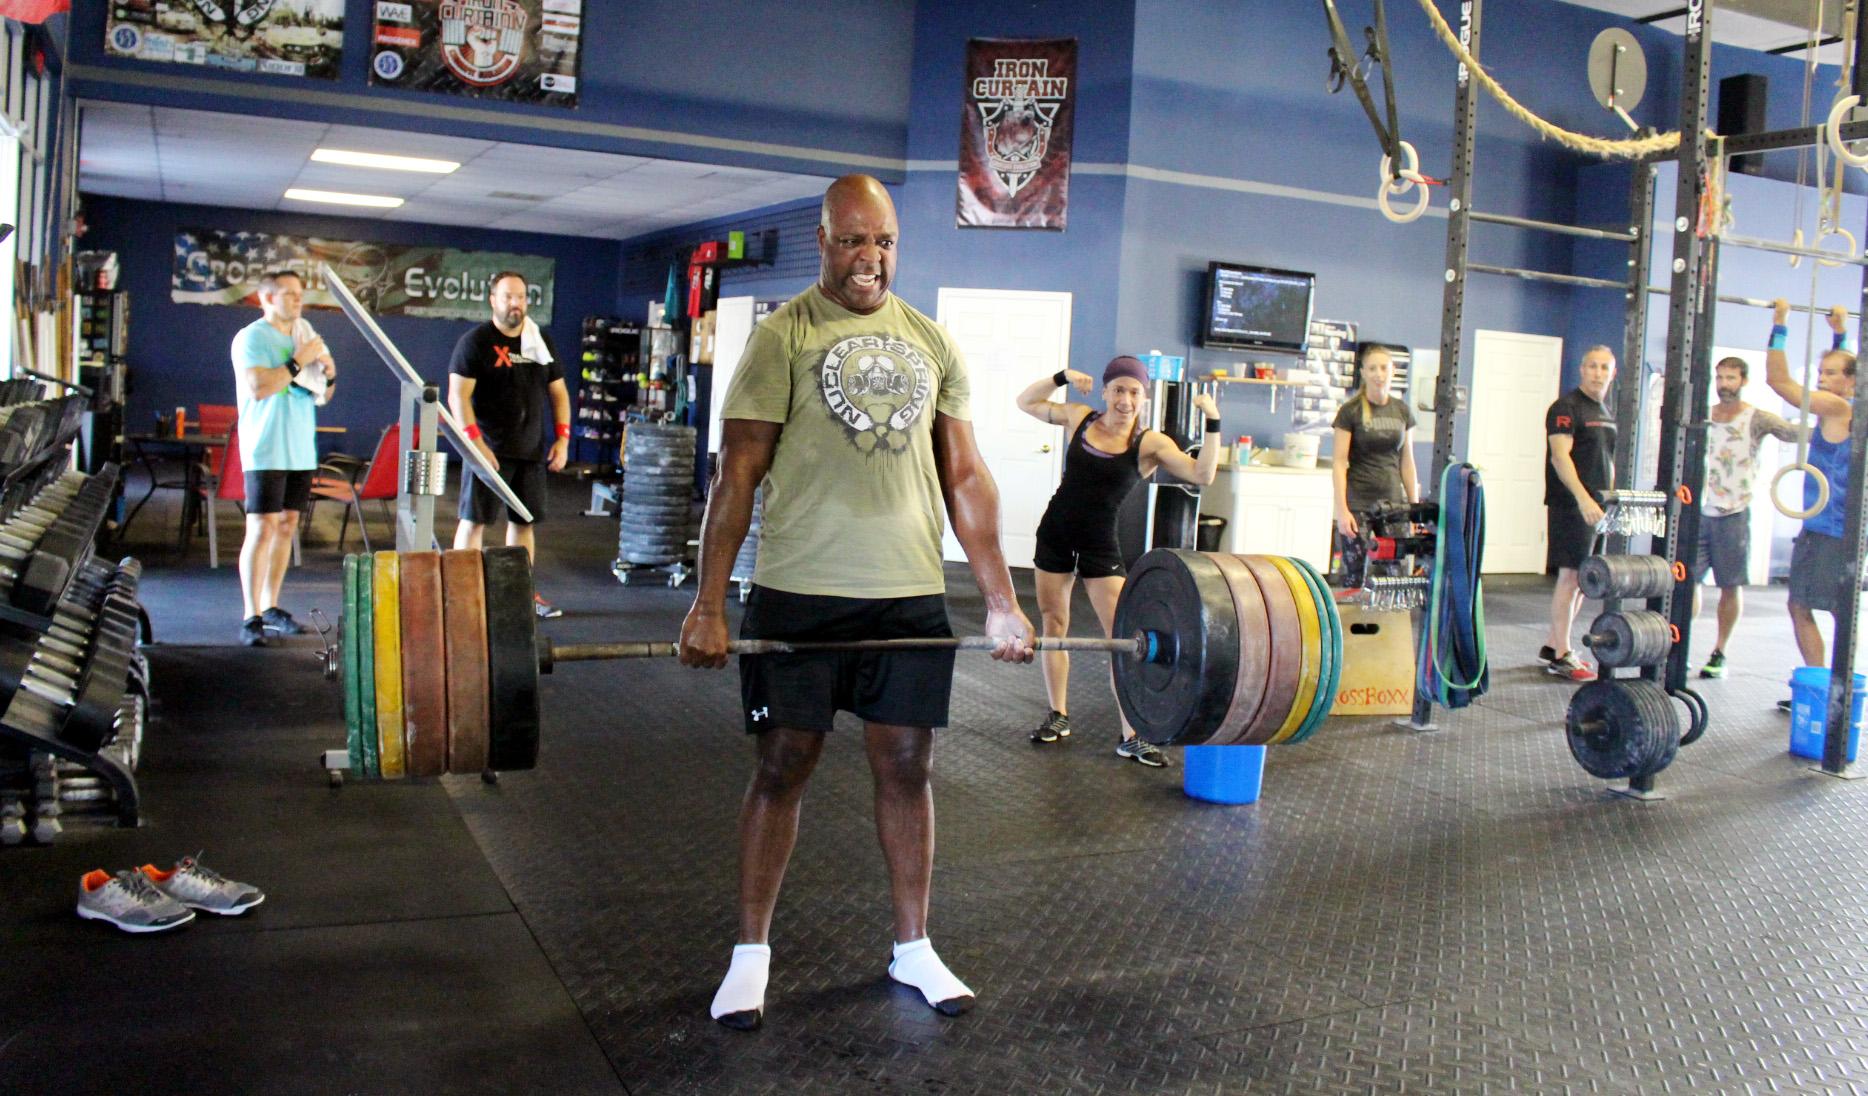 Dr. ABM with 425 lbs Deadlift